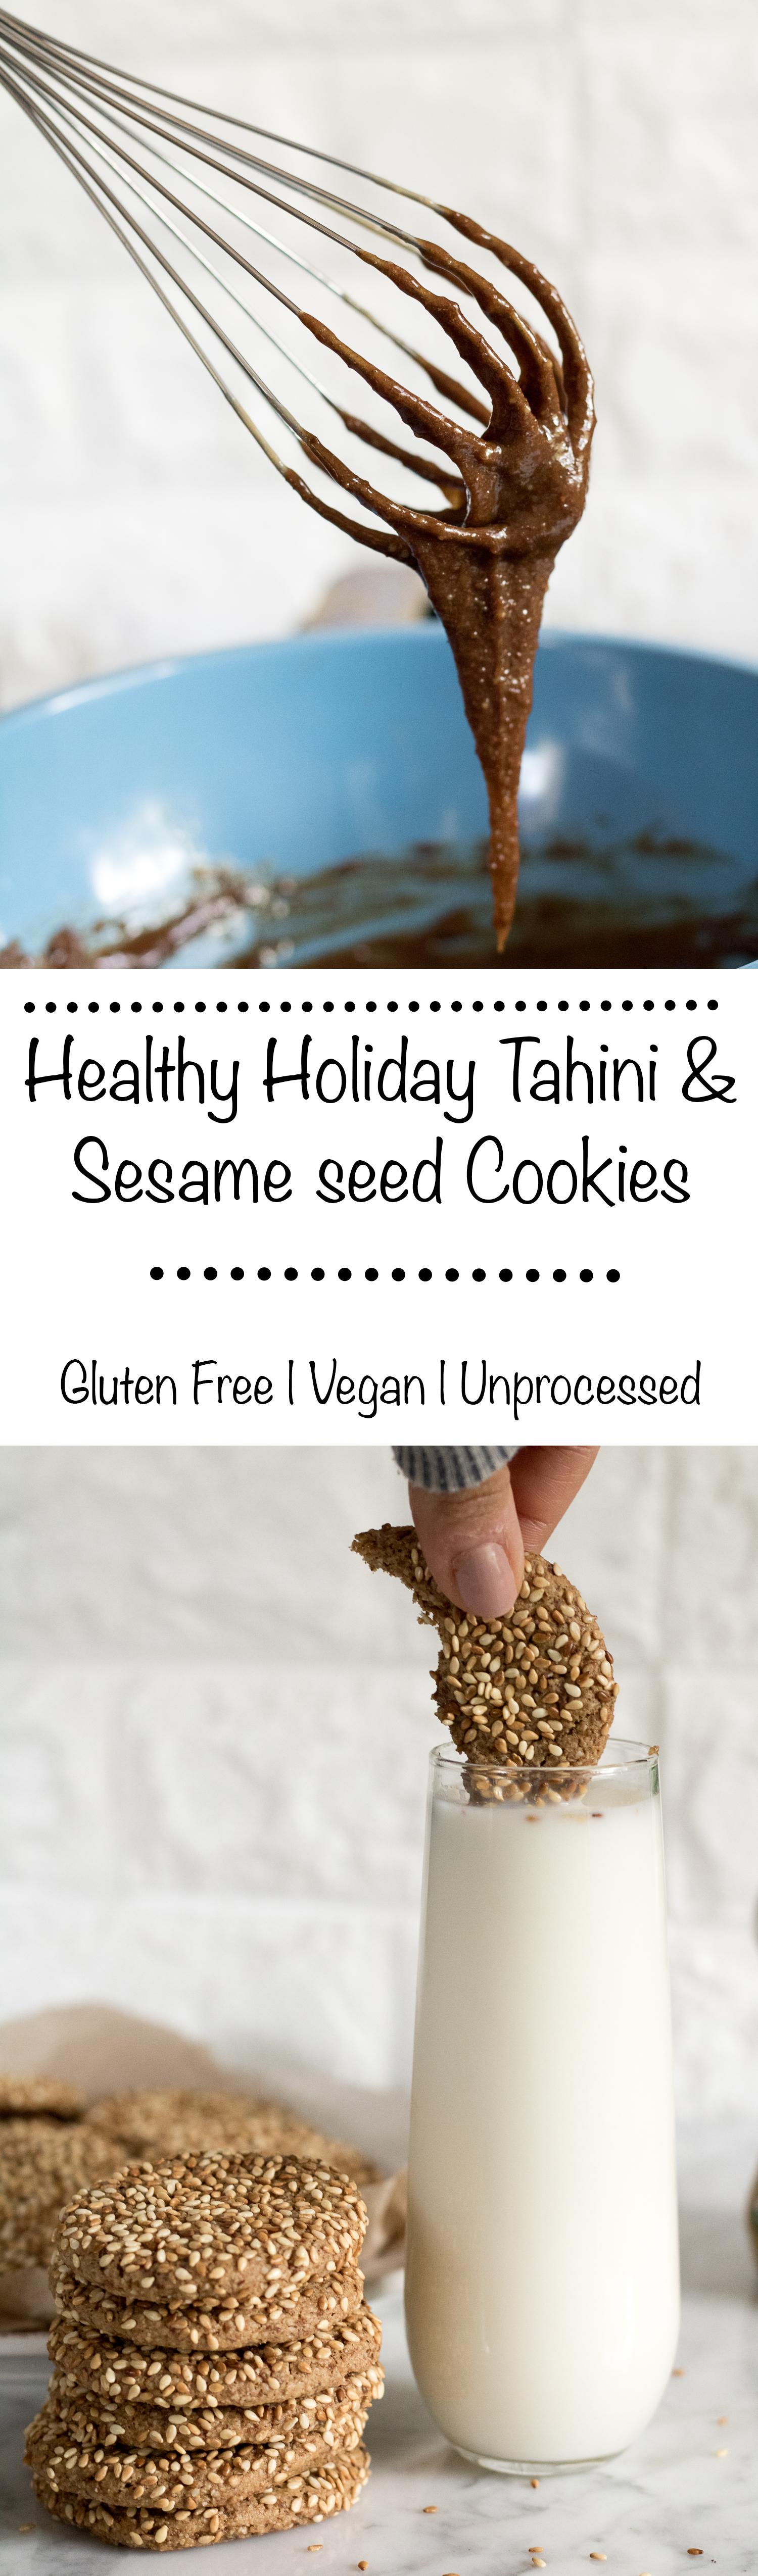 healthy tahini holiday cookies